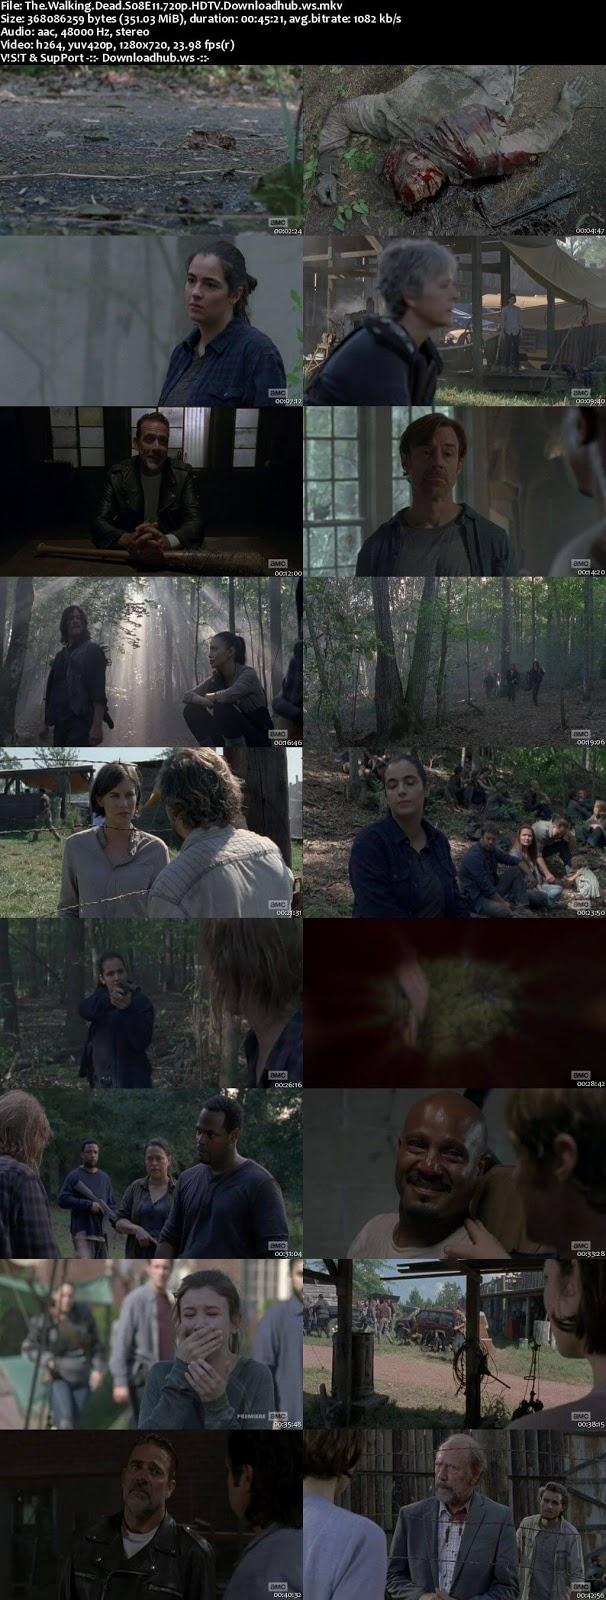 The Walking Dead S08E11  300MB  720p